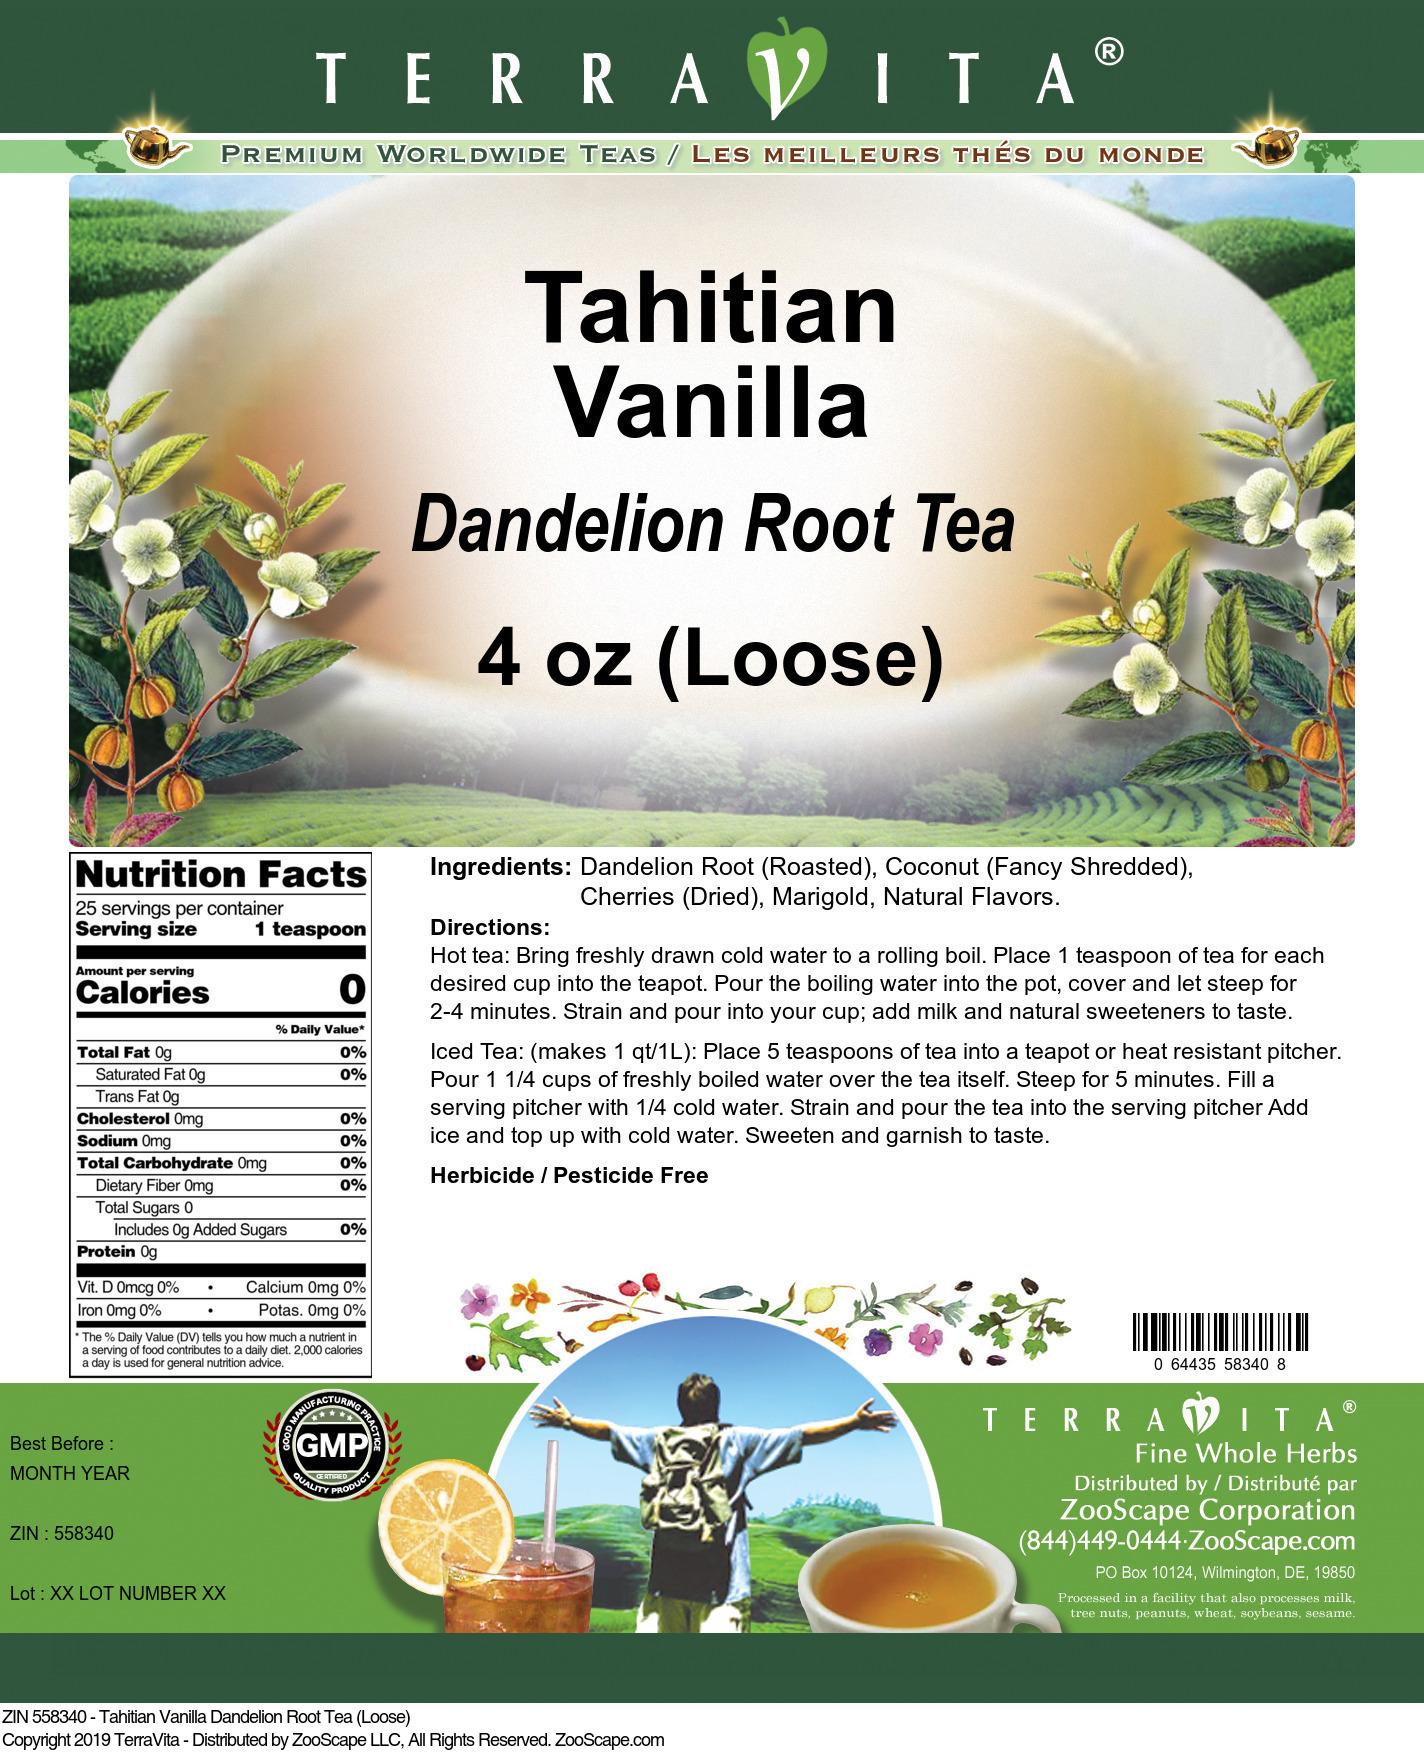 Tahitian Vanilla Dandelion Root